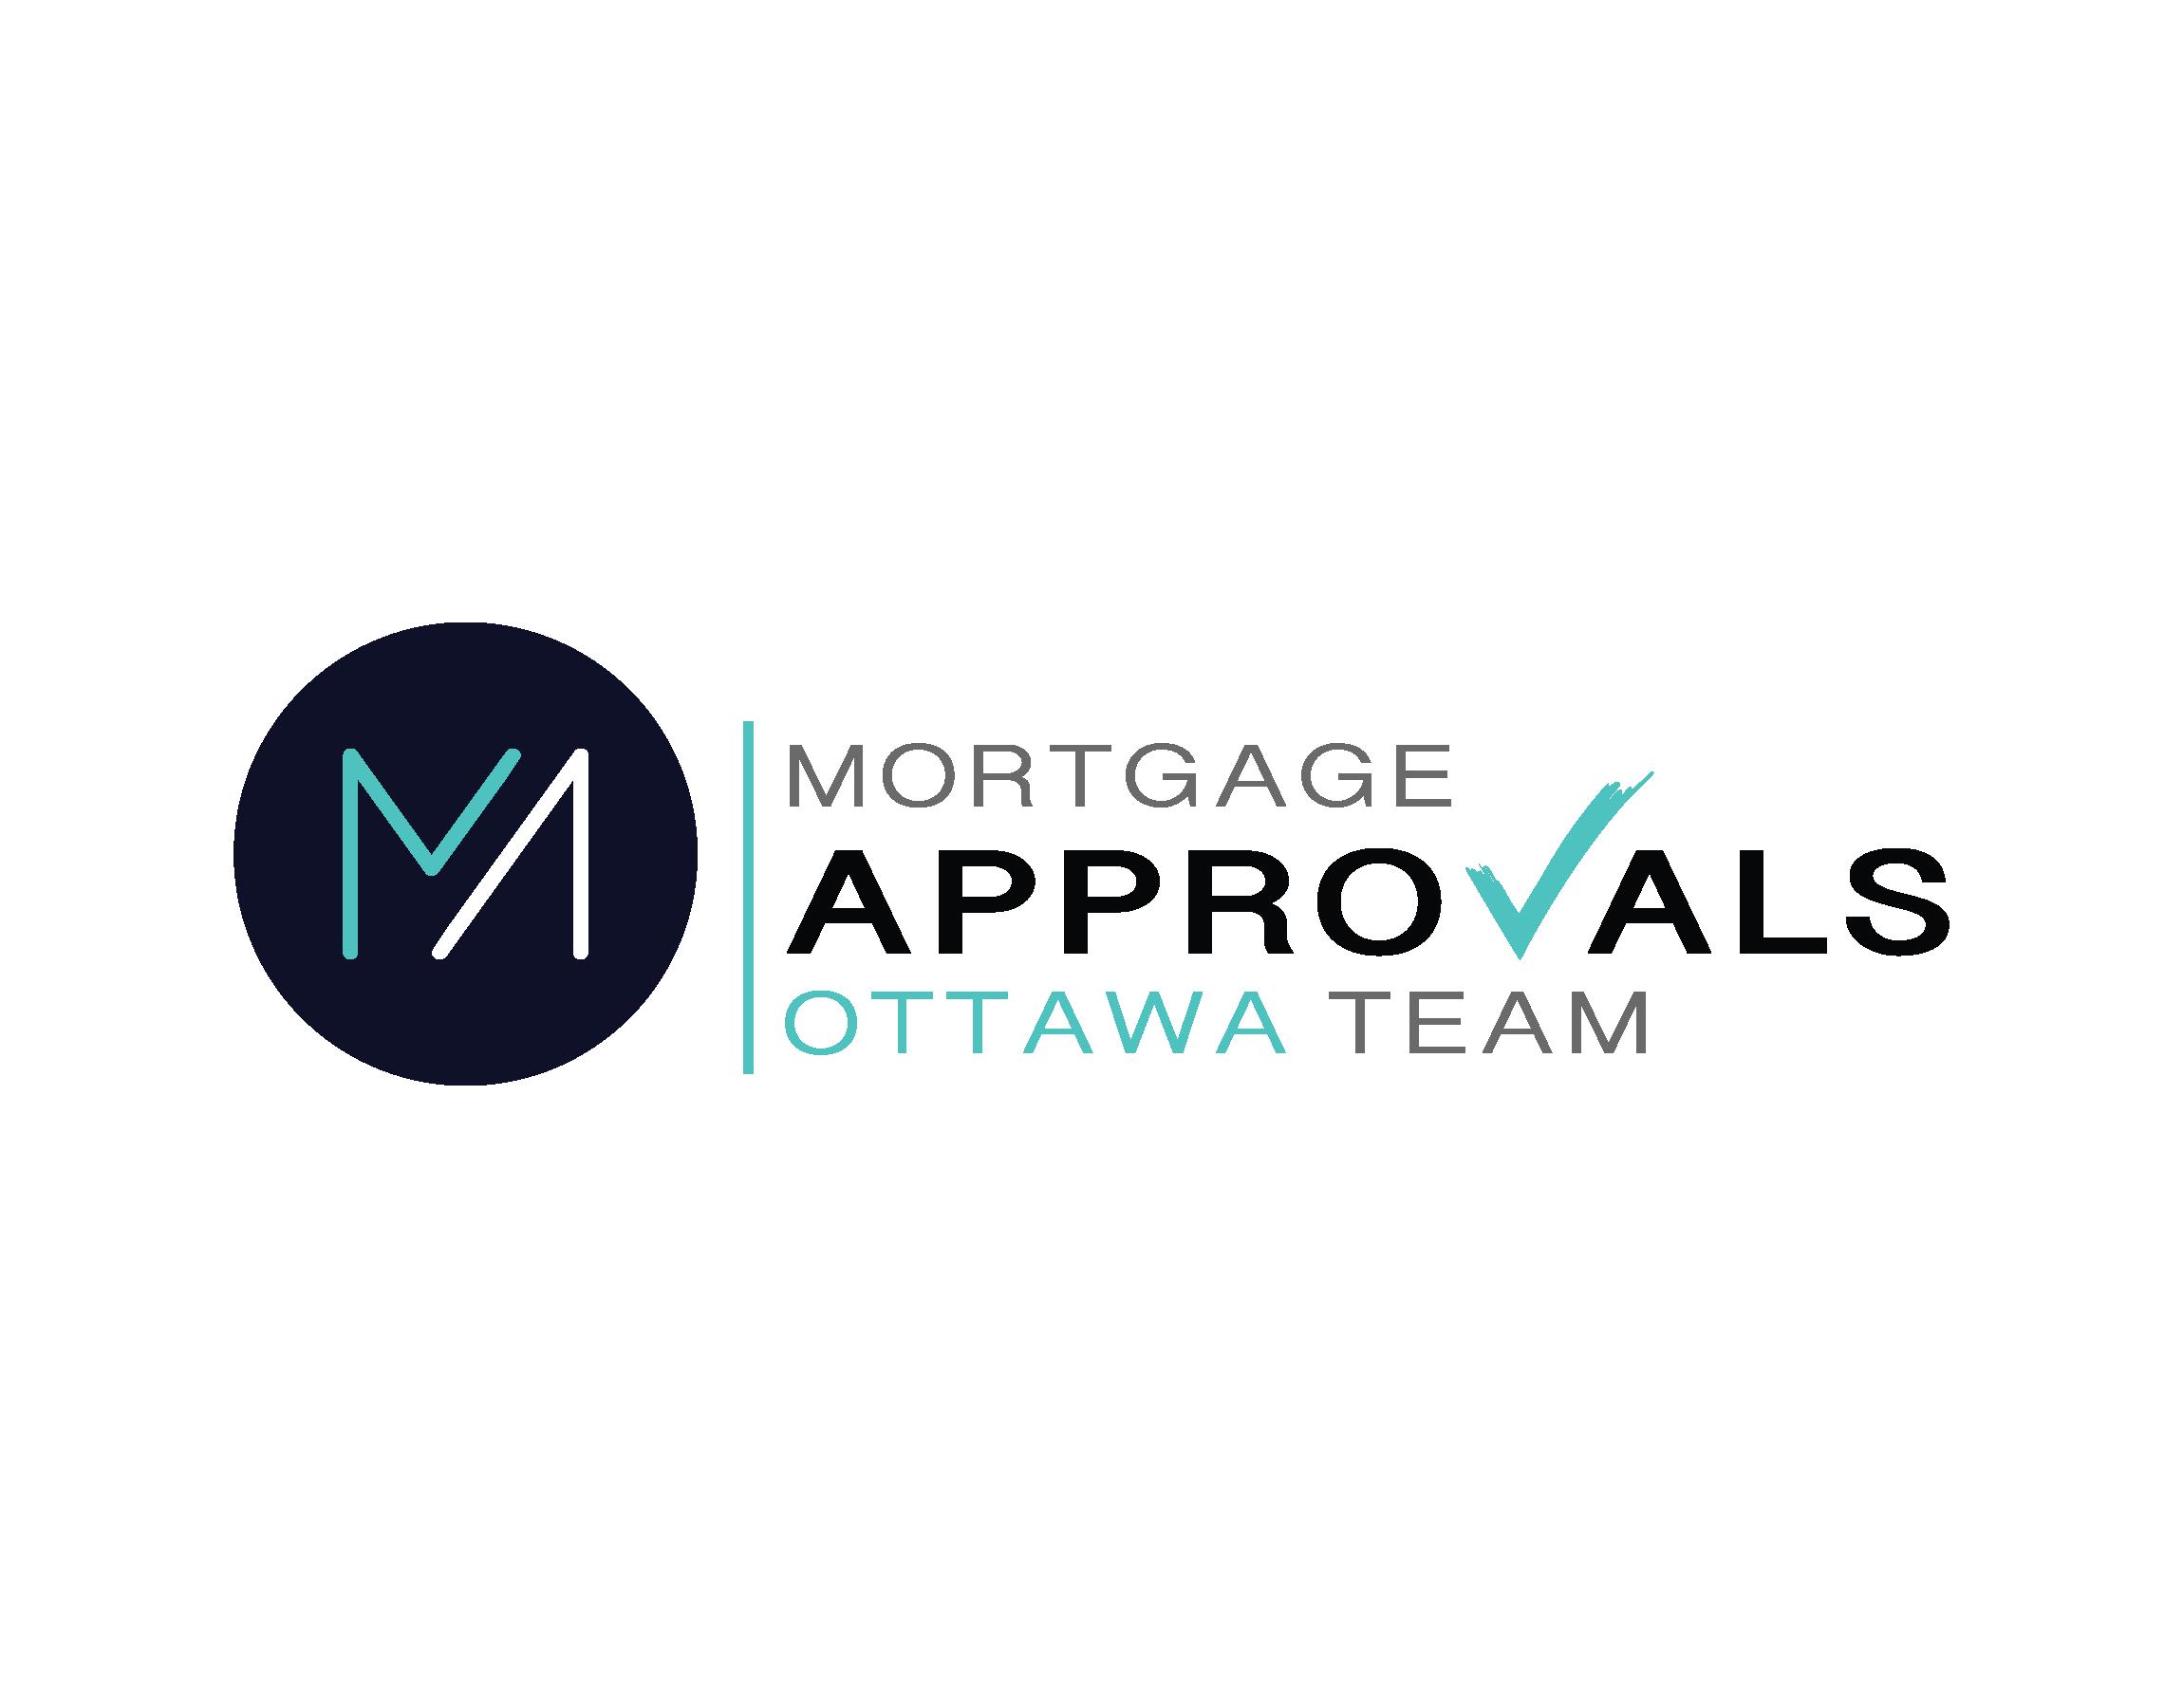 Mortgage Approvals Ottawa